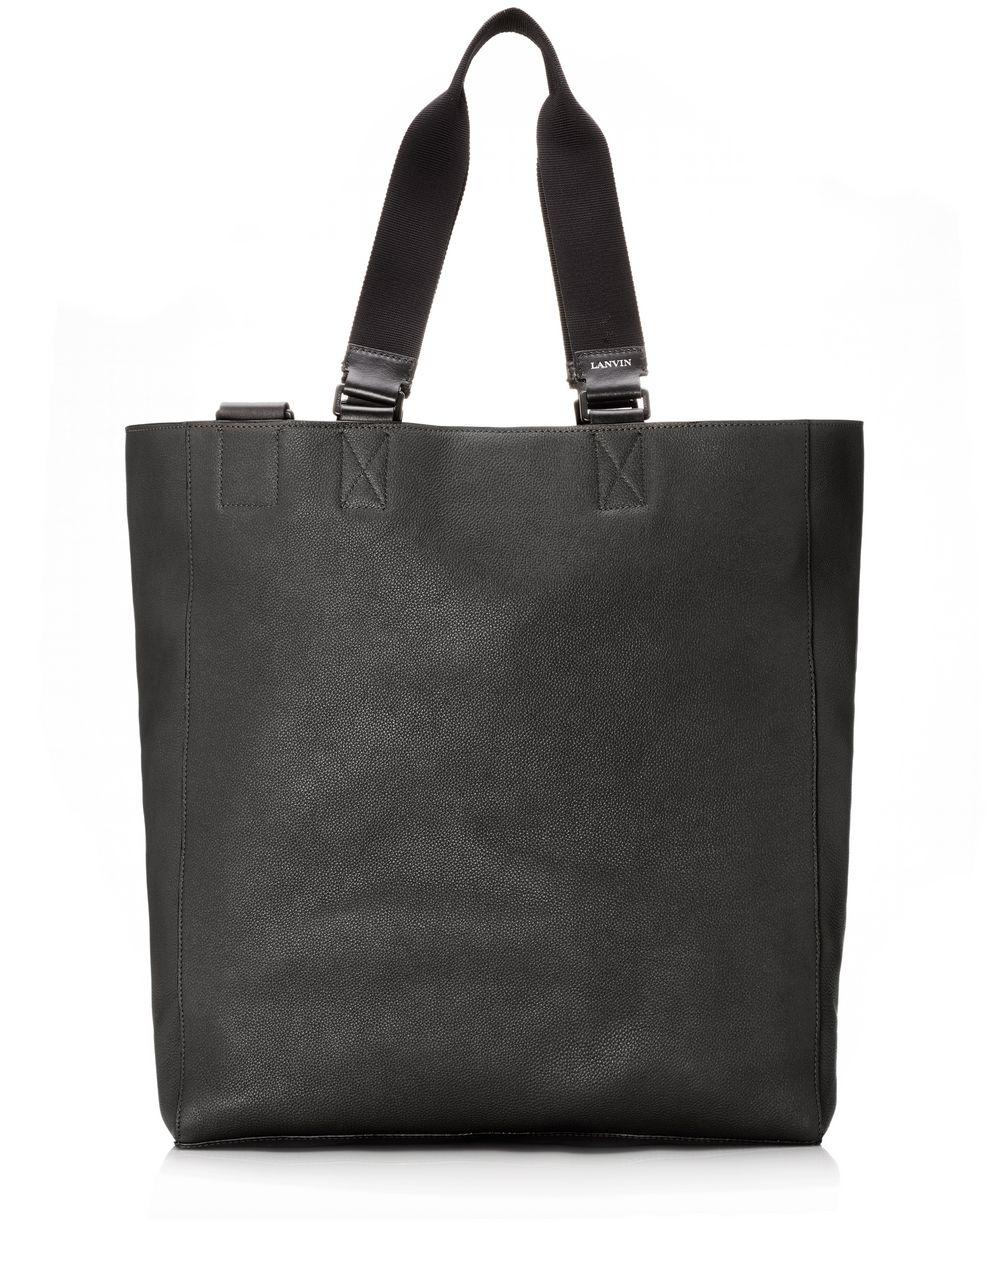 Shopper bag in natural grain calfskin - Lanvin